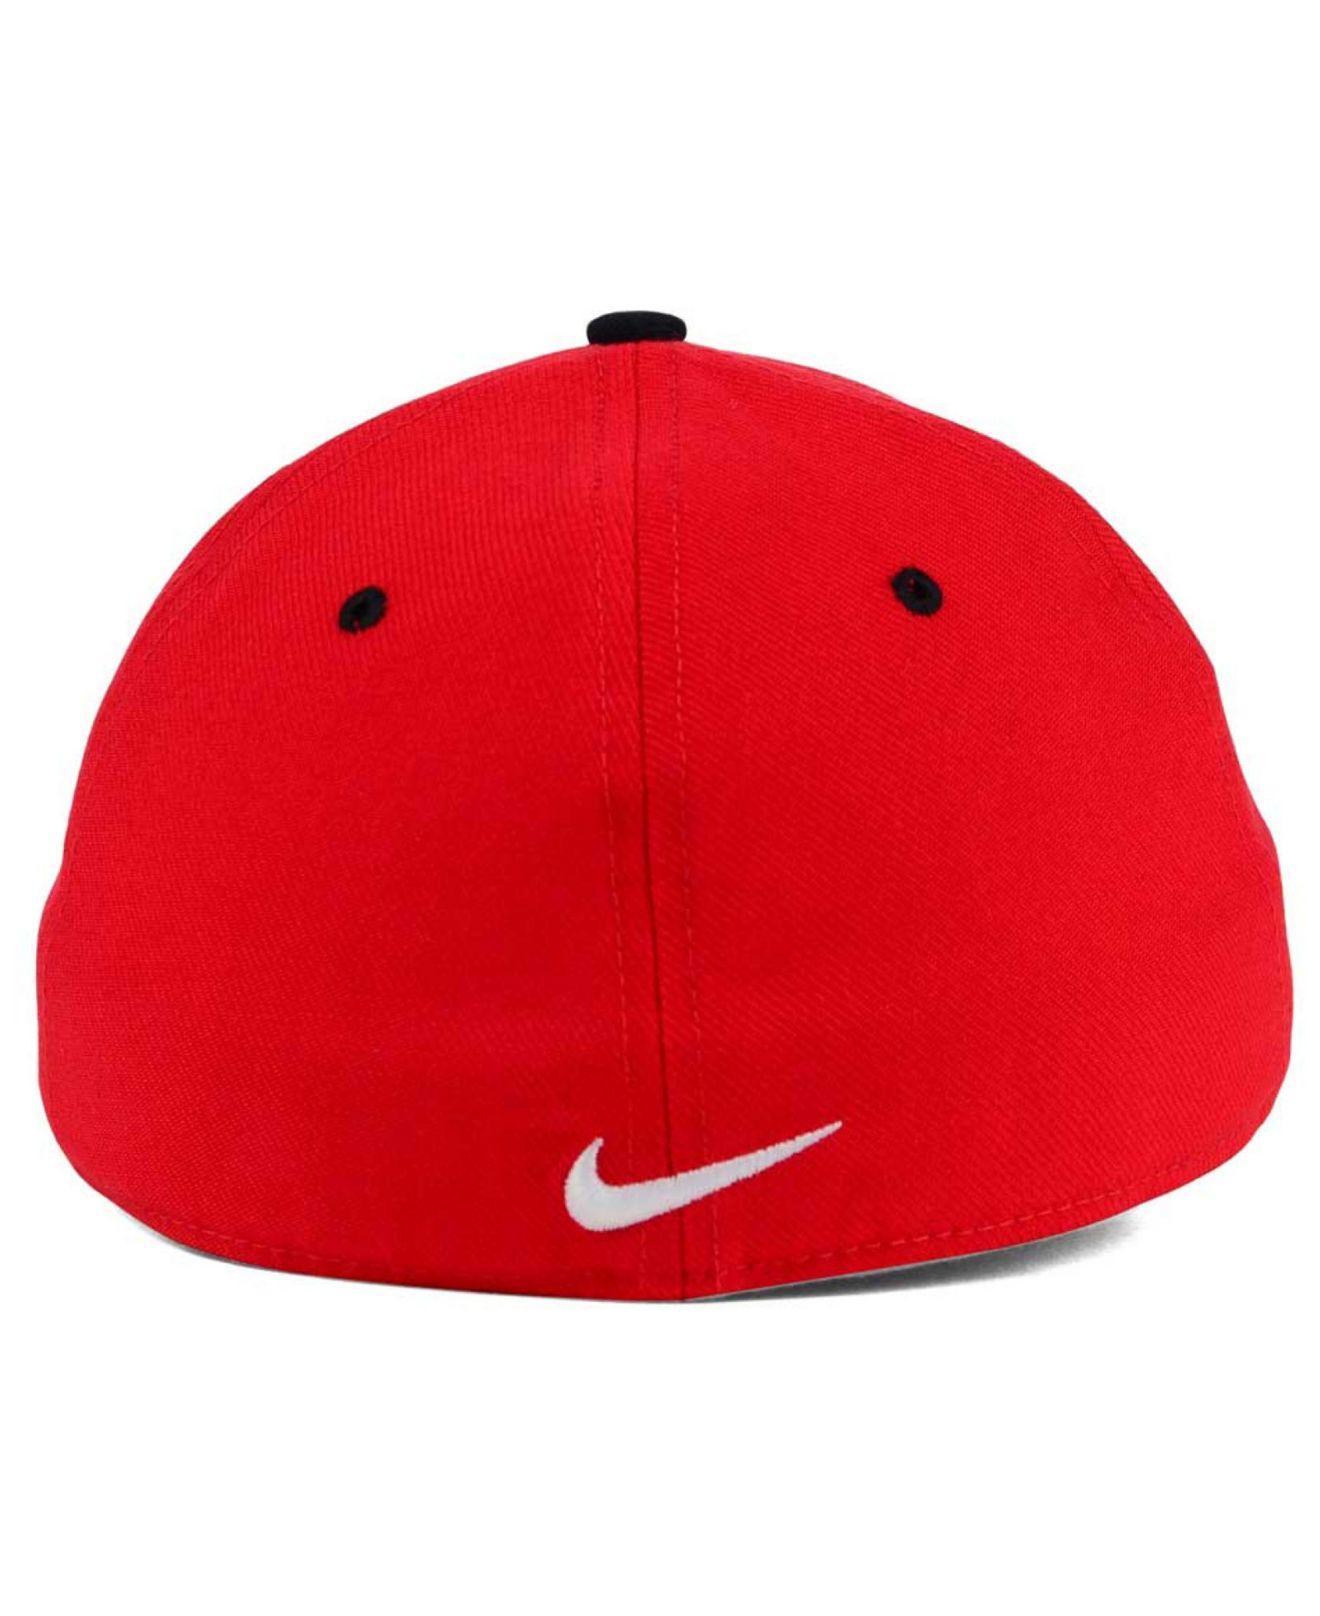 newest 83501 7b21b ... buy lyst nike ohio state buckeyes l91 swooshflex cap in red for men  79bd4 1d30b